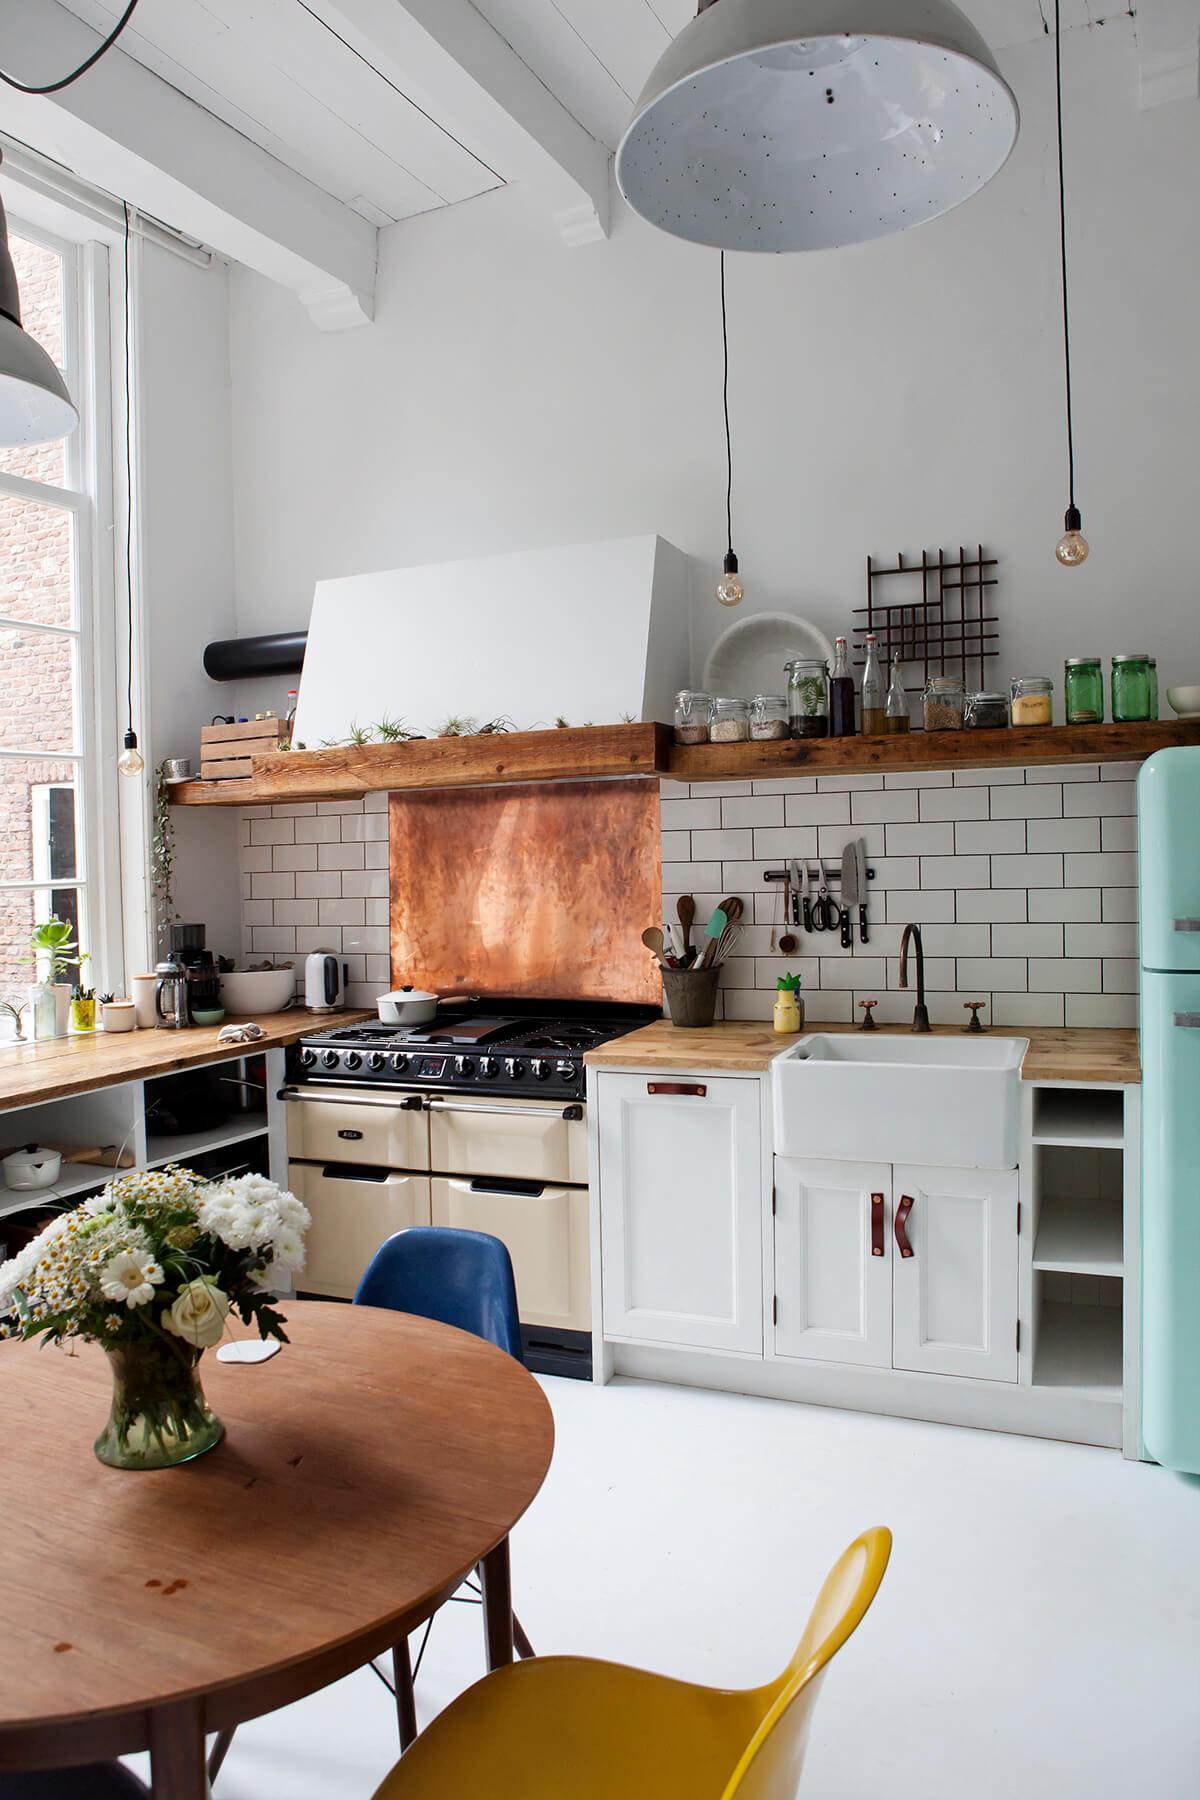 Retro Kitchen Design Pictures